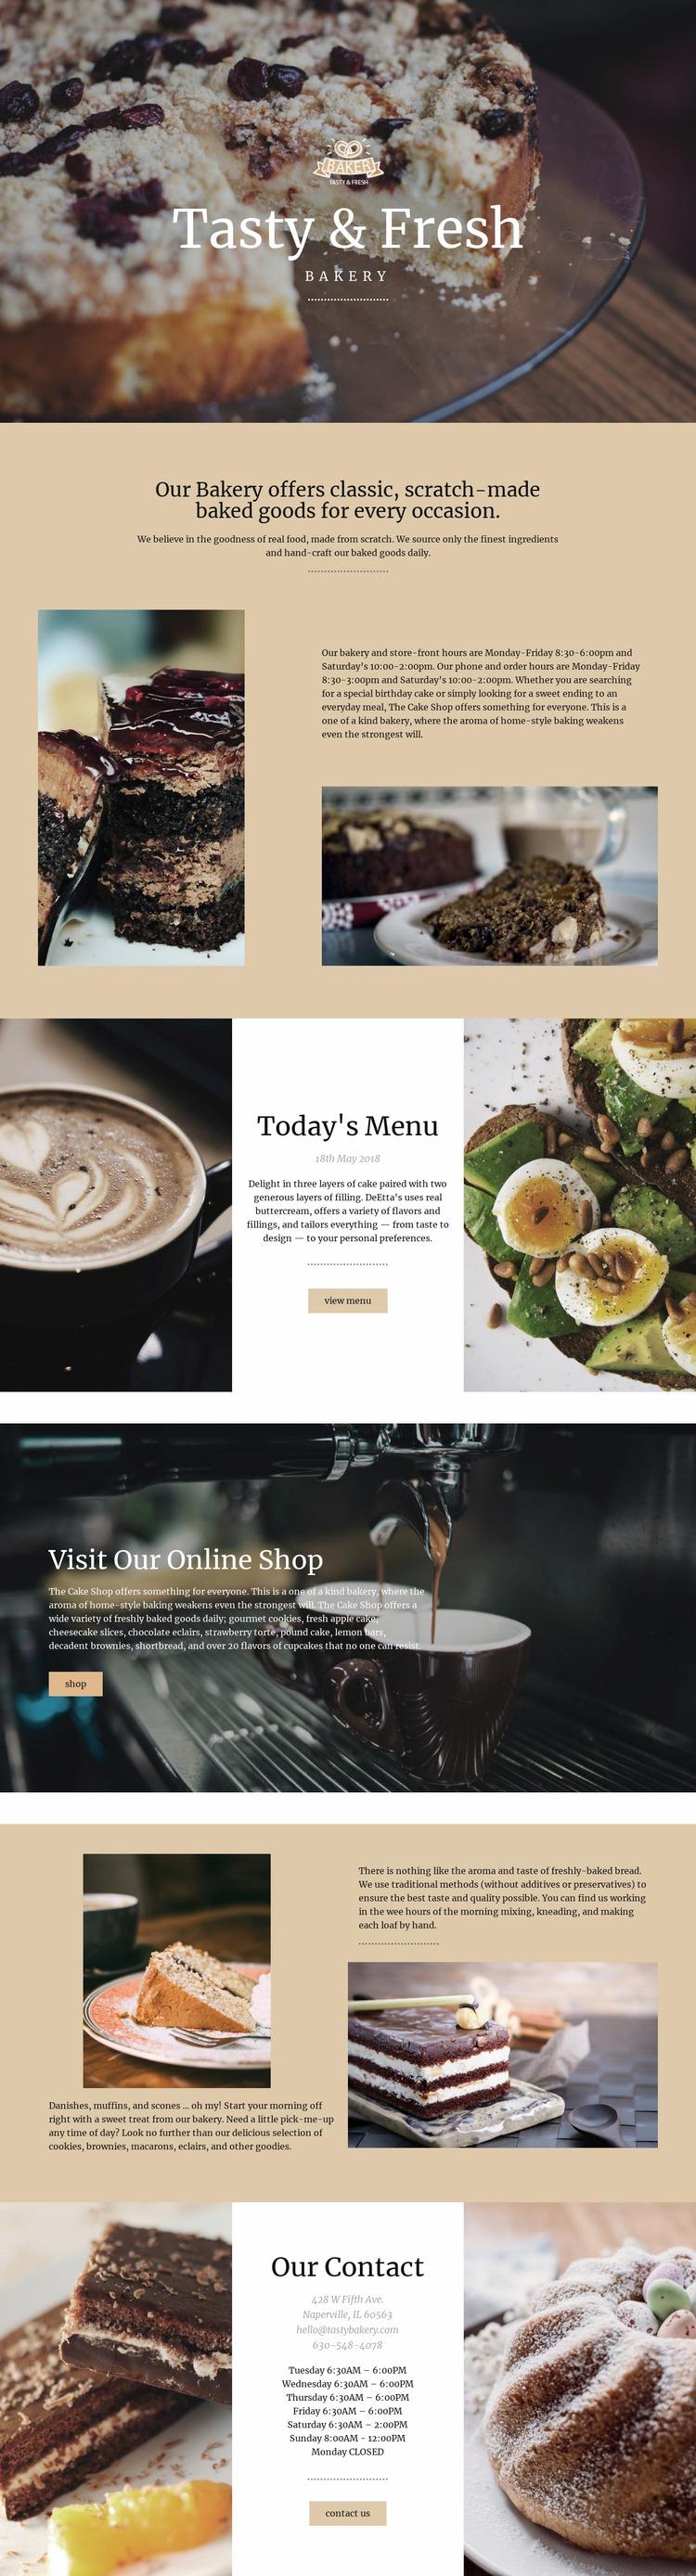 Tasty and fresh food Website Mockup